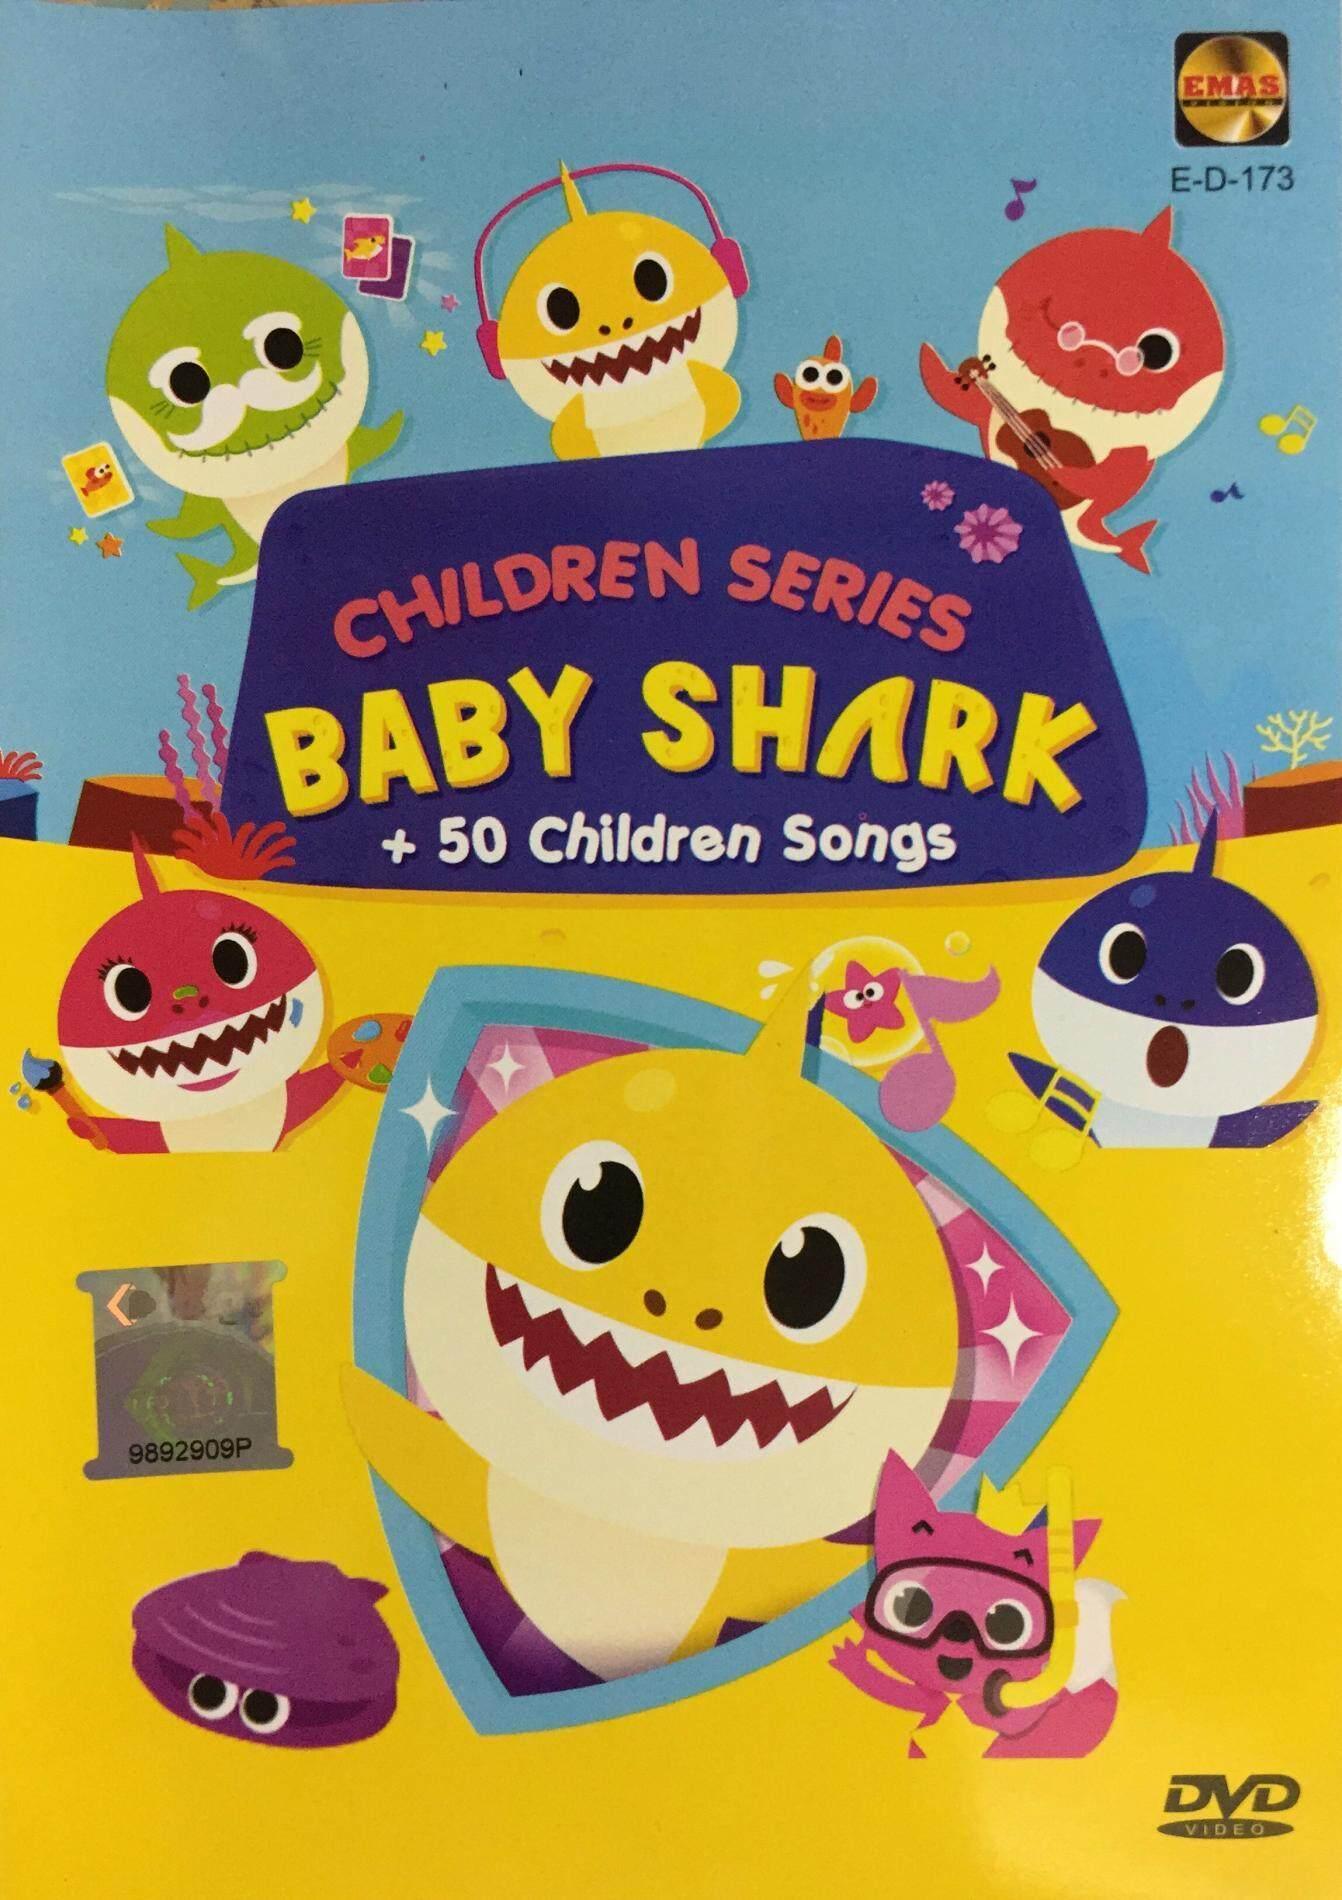 BABY SHARK 鲨鱼宝宝 + 50 CHILDREN SONGS DVD - CHILDREN SERIES(ENGLISH)